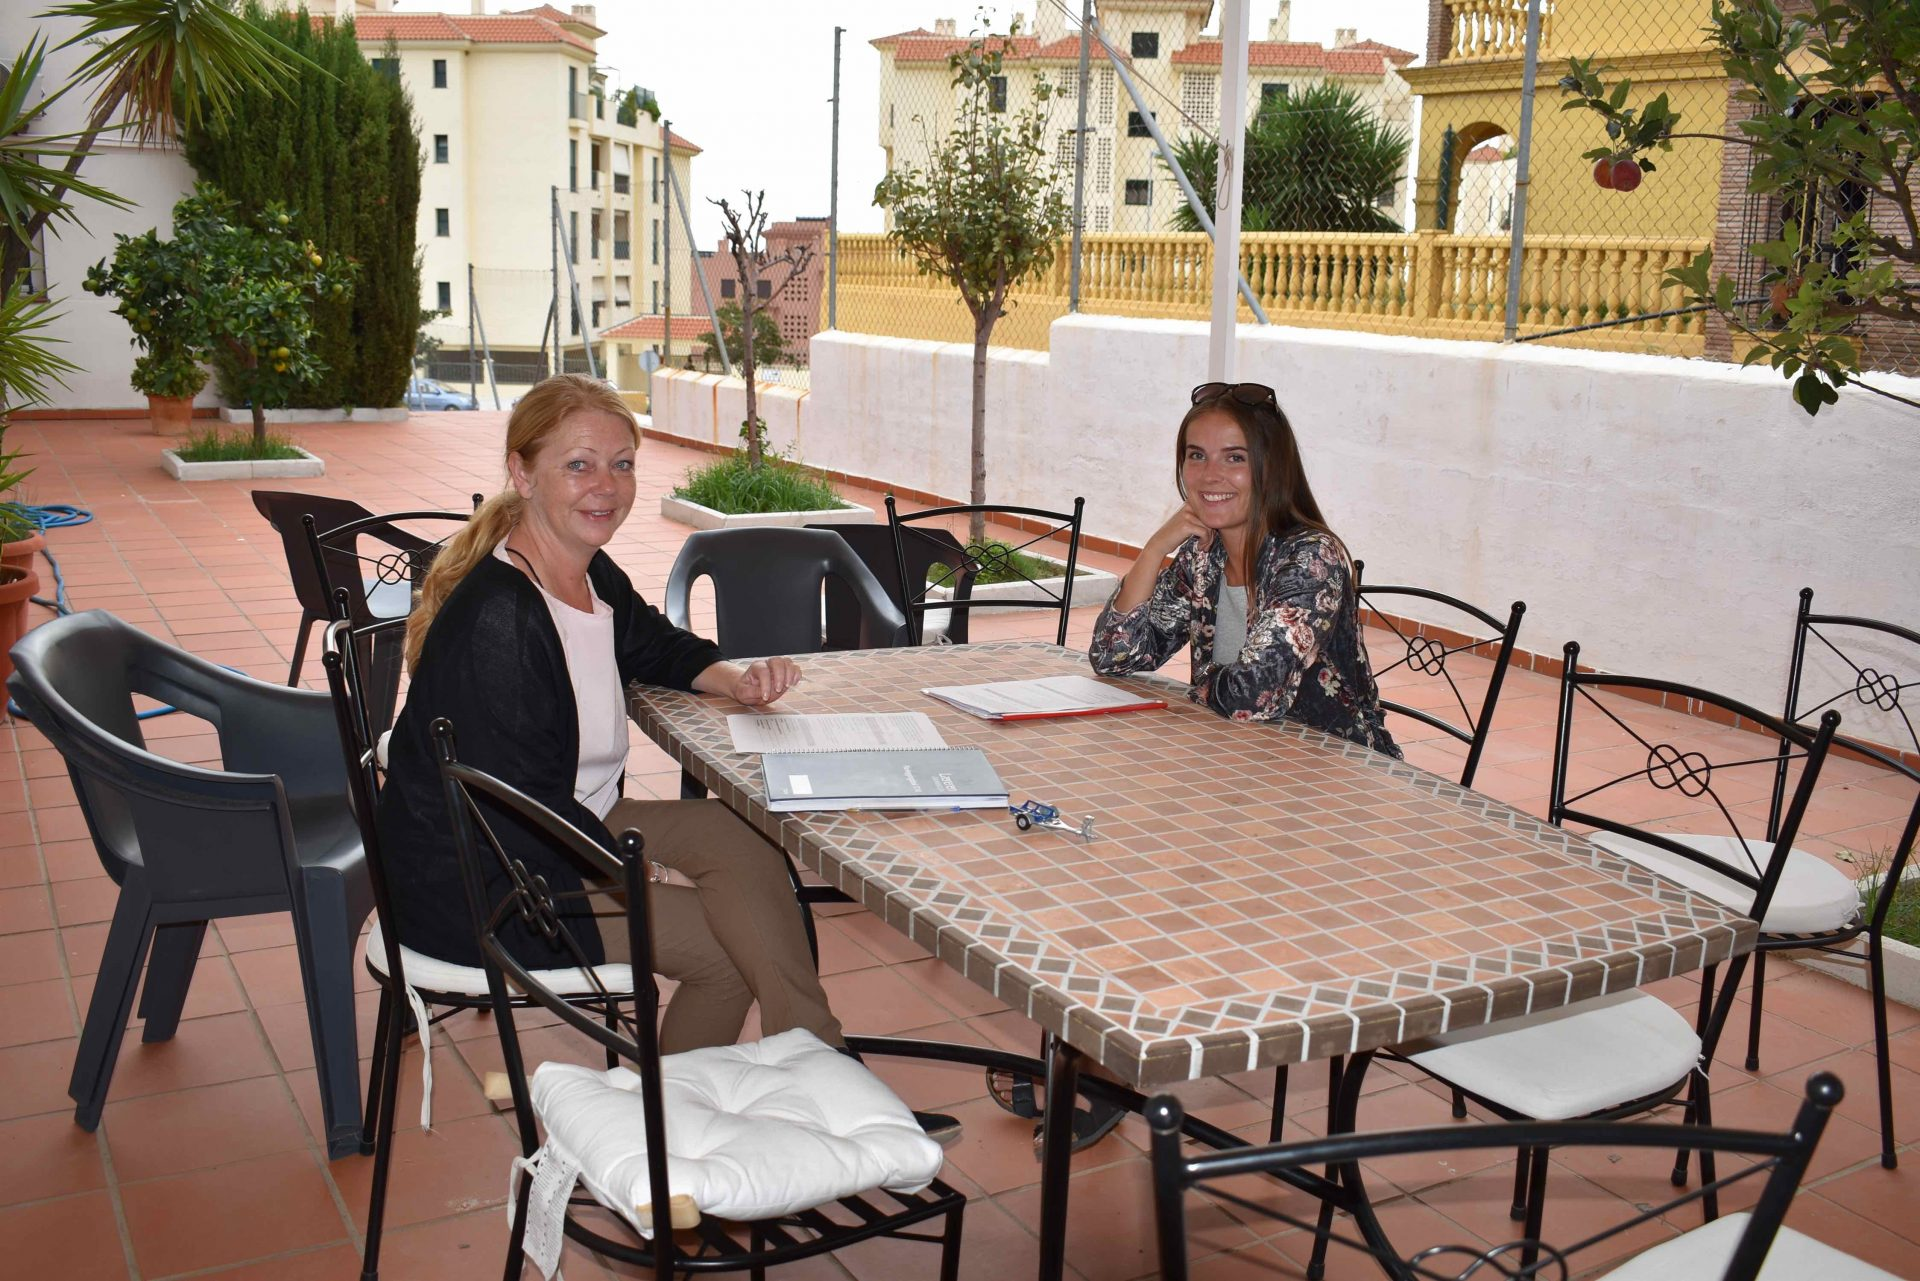 Fra Volda til Malaga for praksis